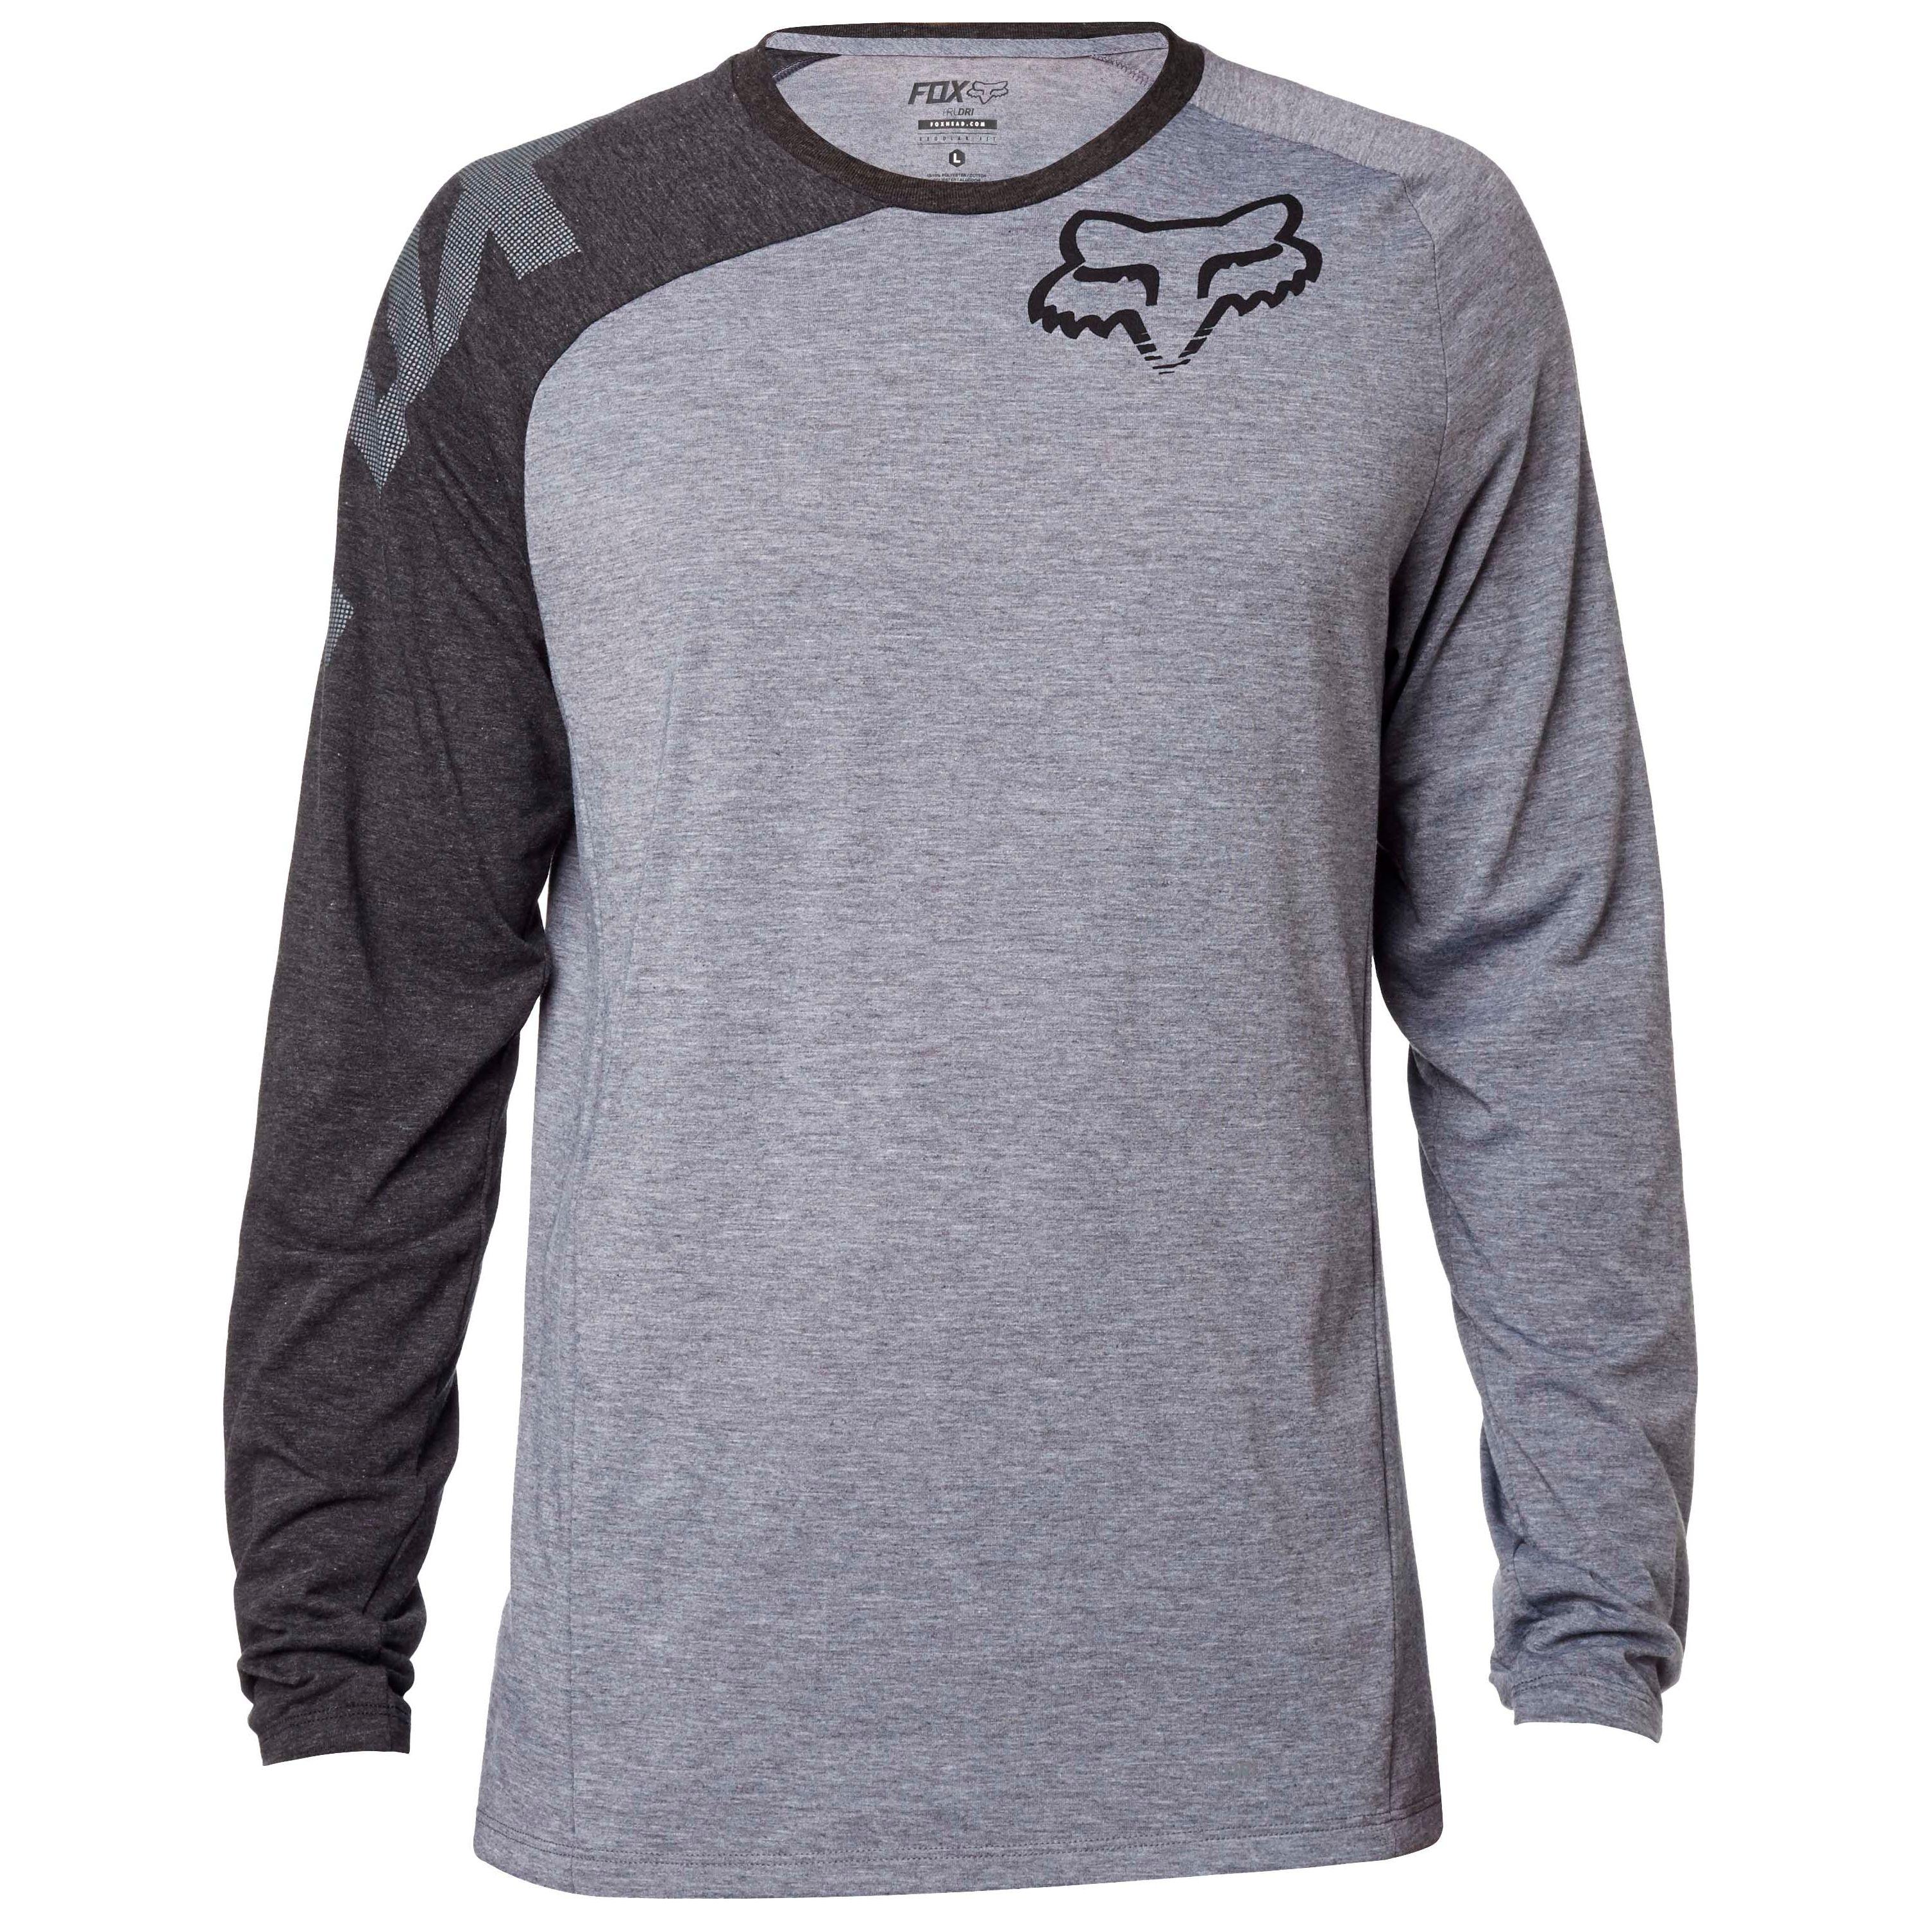 T-shirt Manches Longues Fox Distinguish